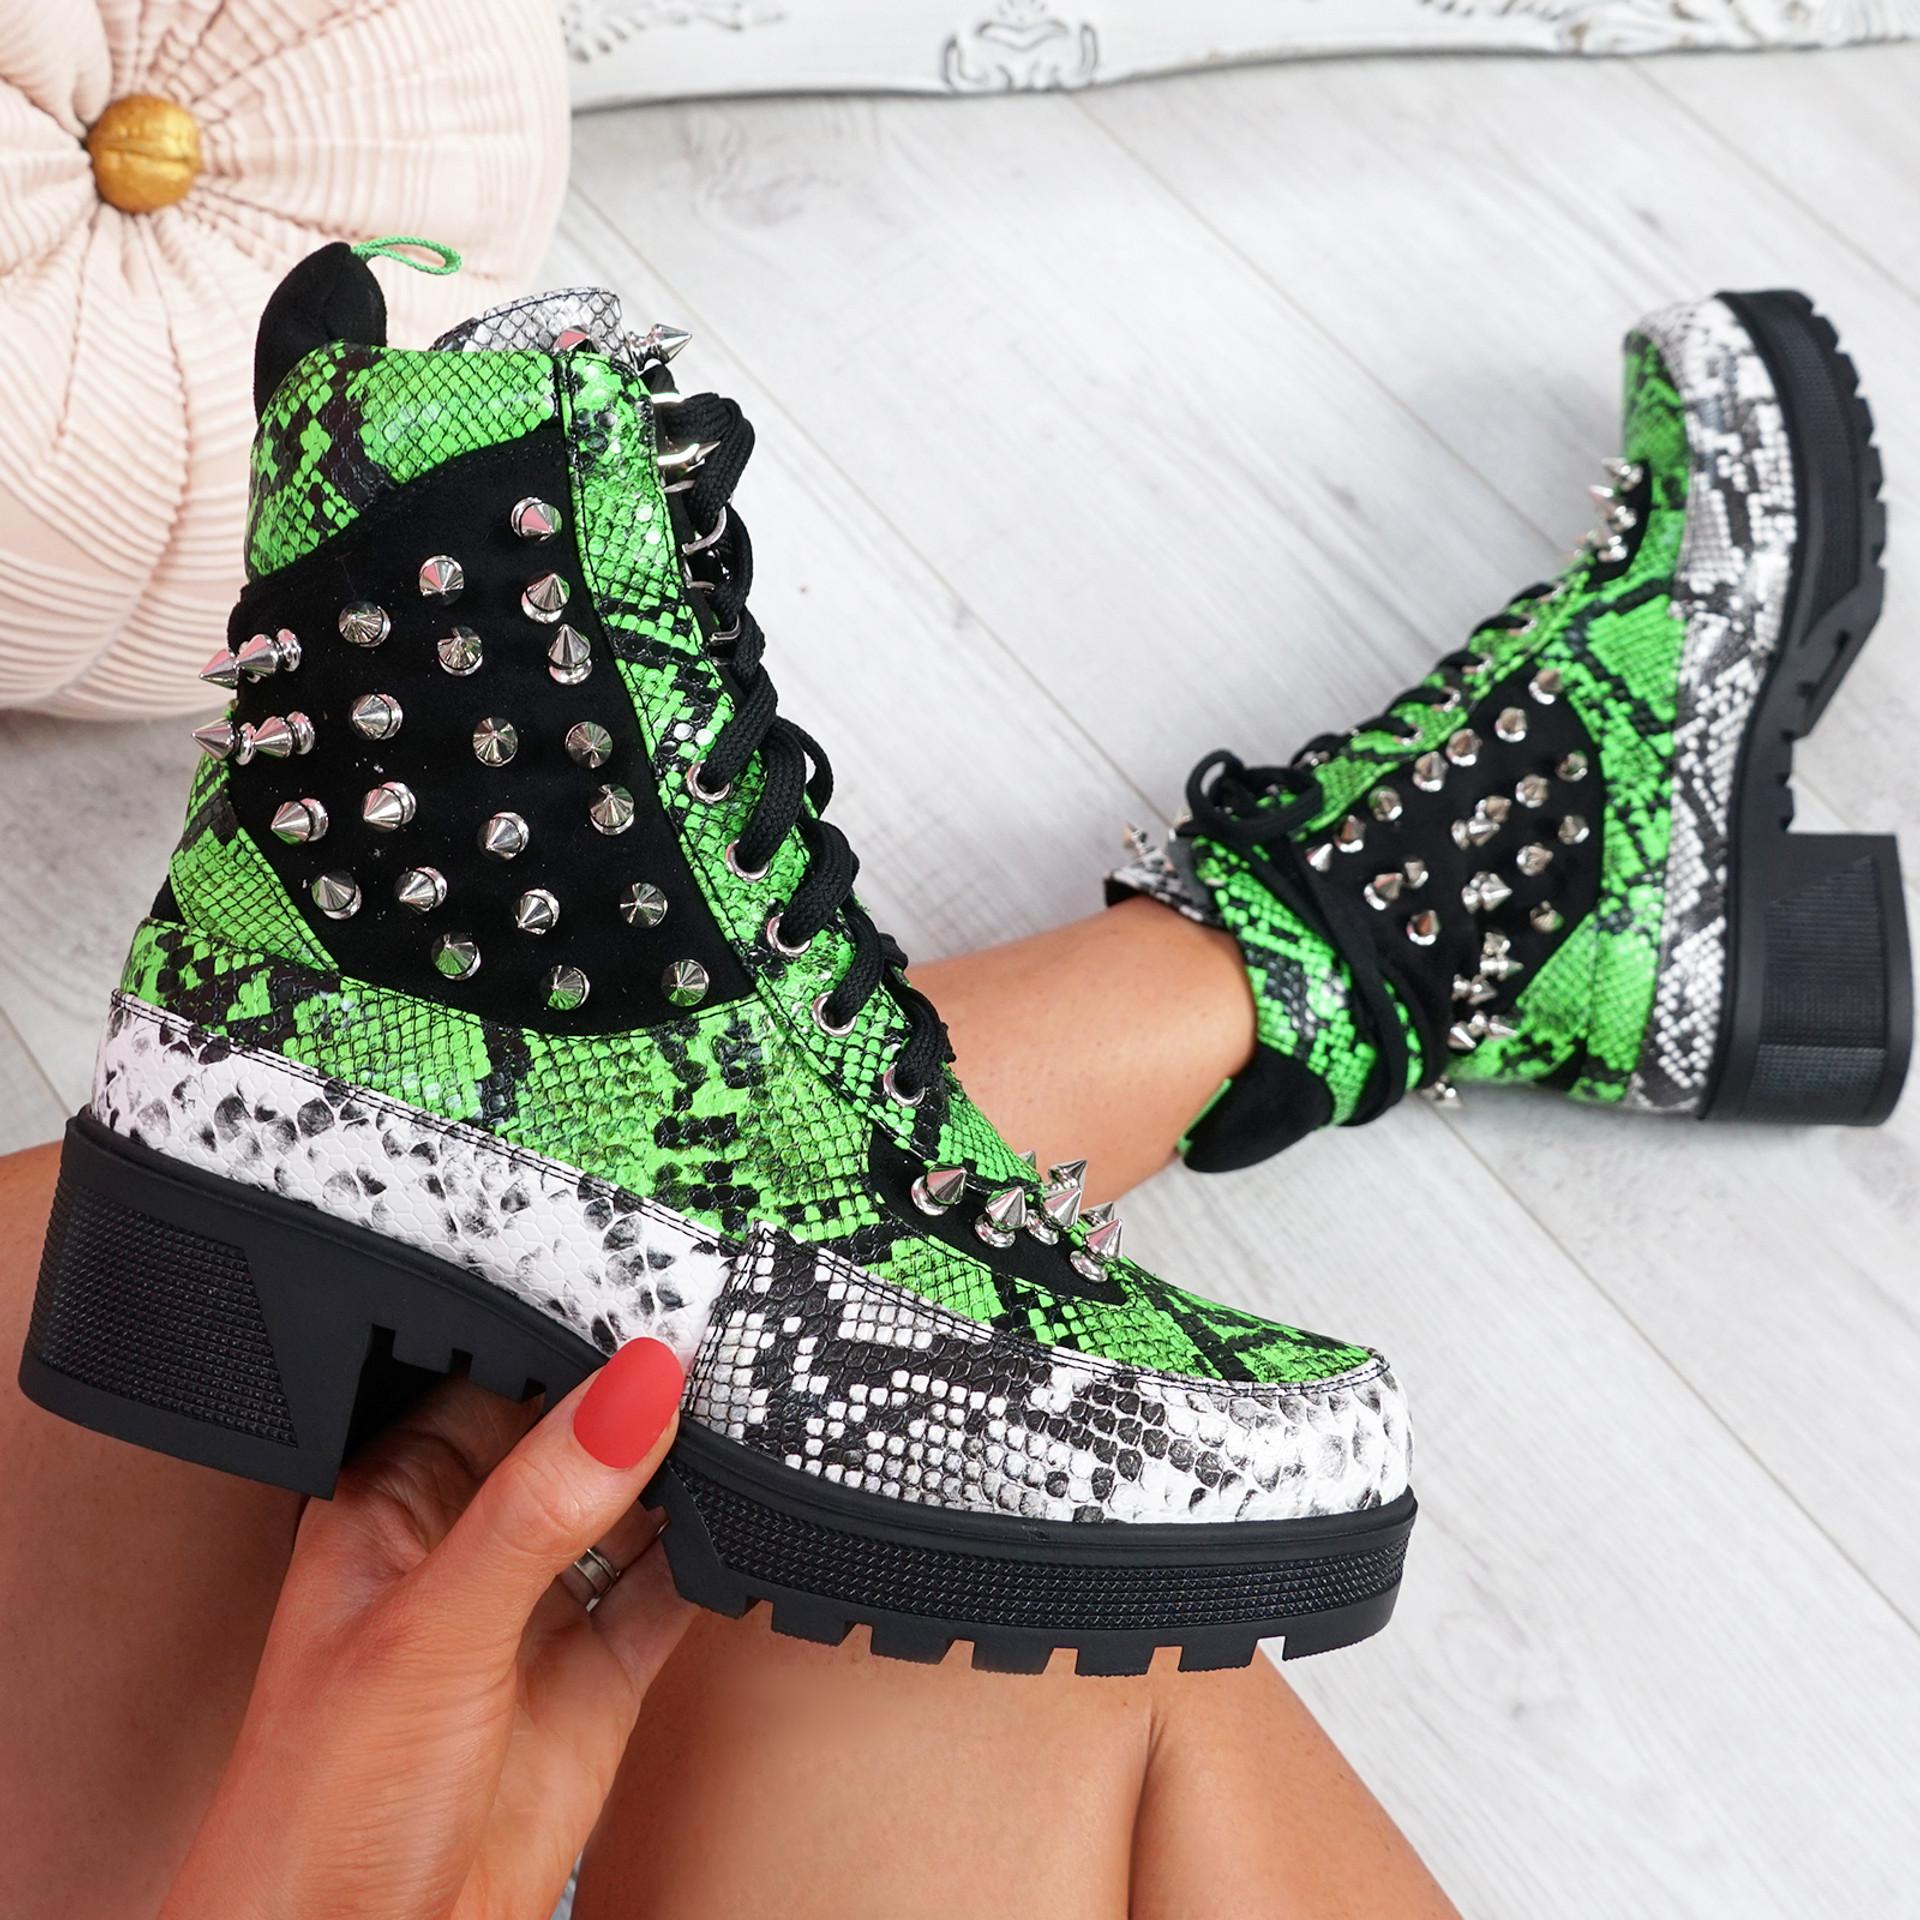 Ivna Snake Spike Studded Ankle Boots